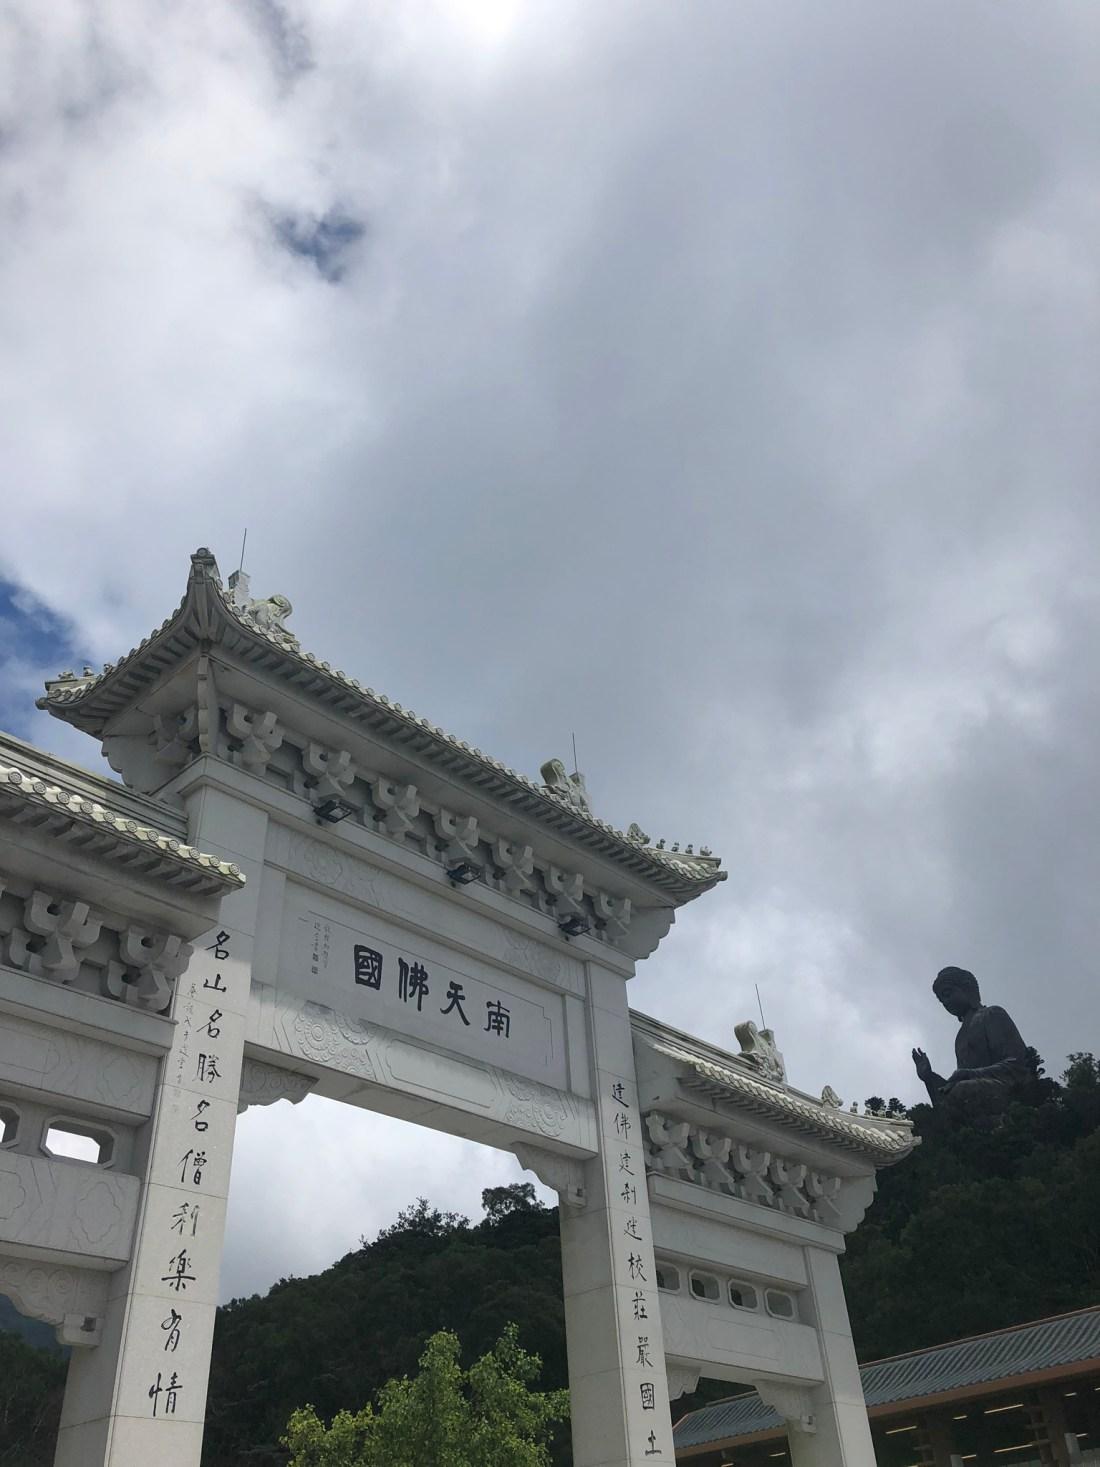 Arch and Big Buddha on Lantau Island, Hong Kong